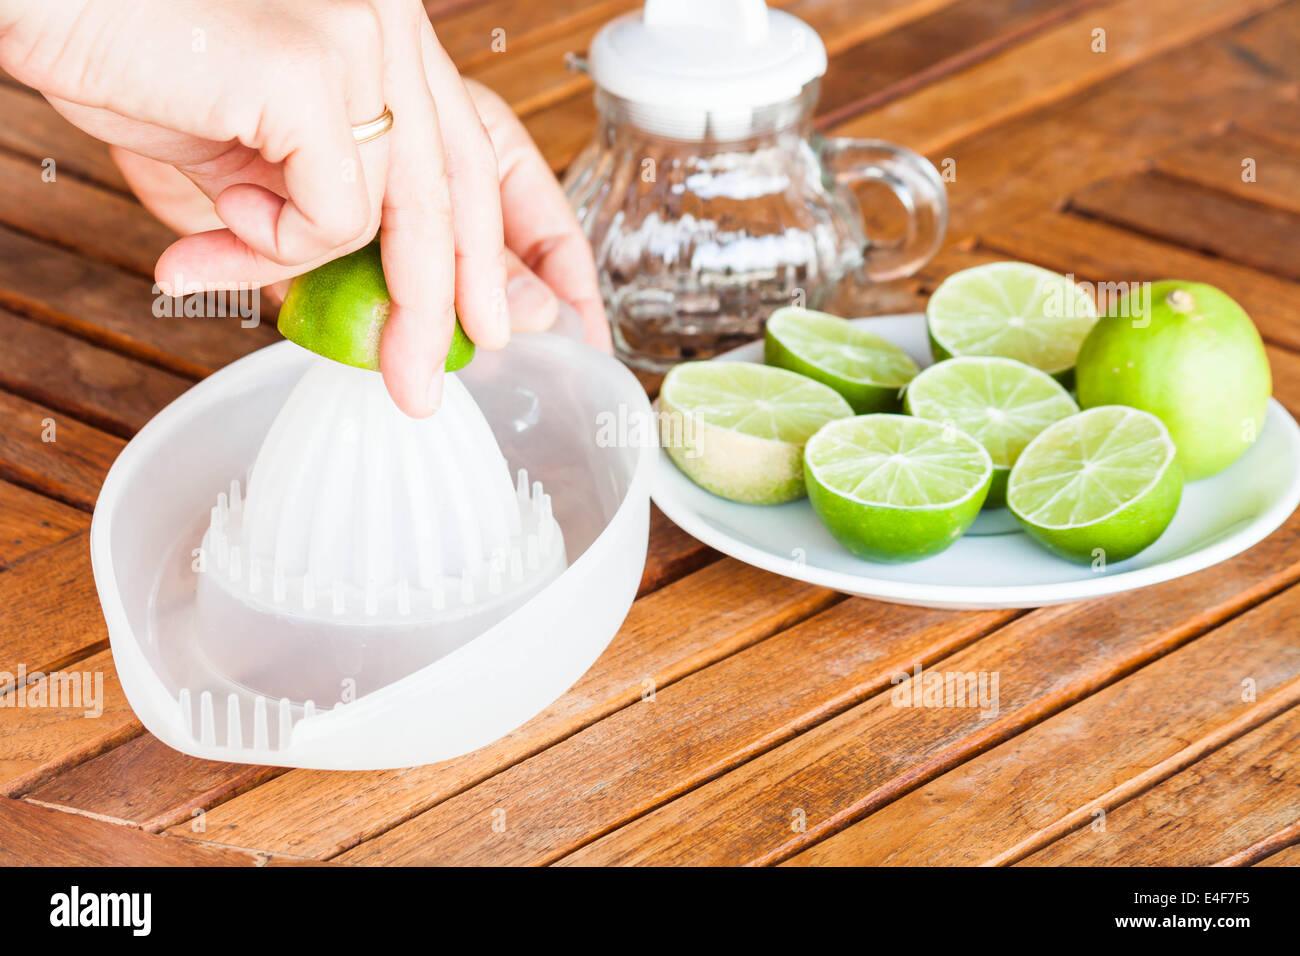 Hand squashing fresh lime on wood table - Stock Image